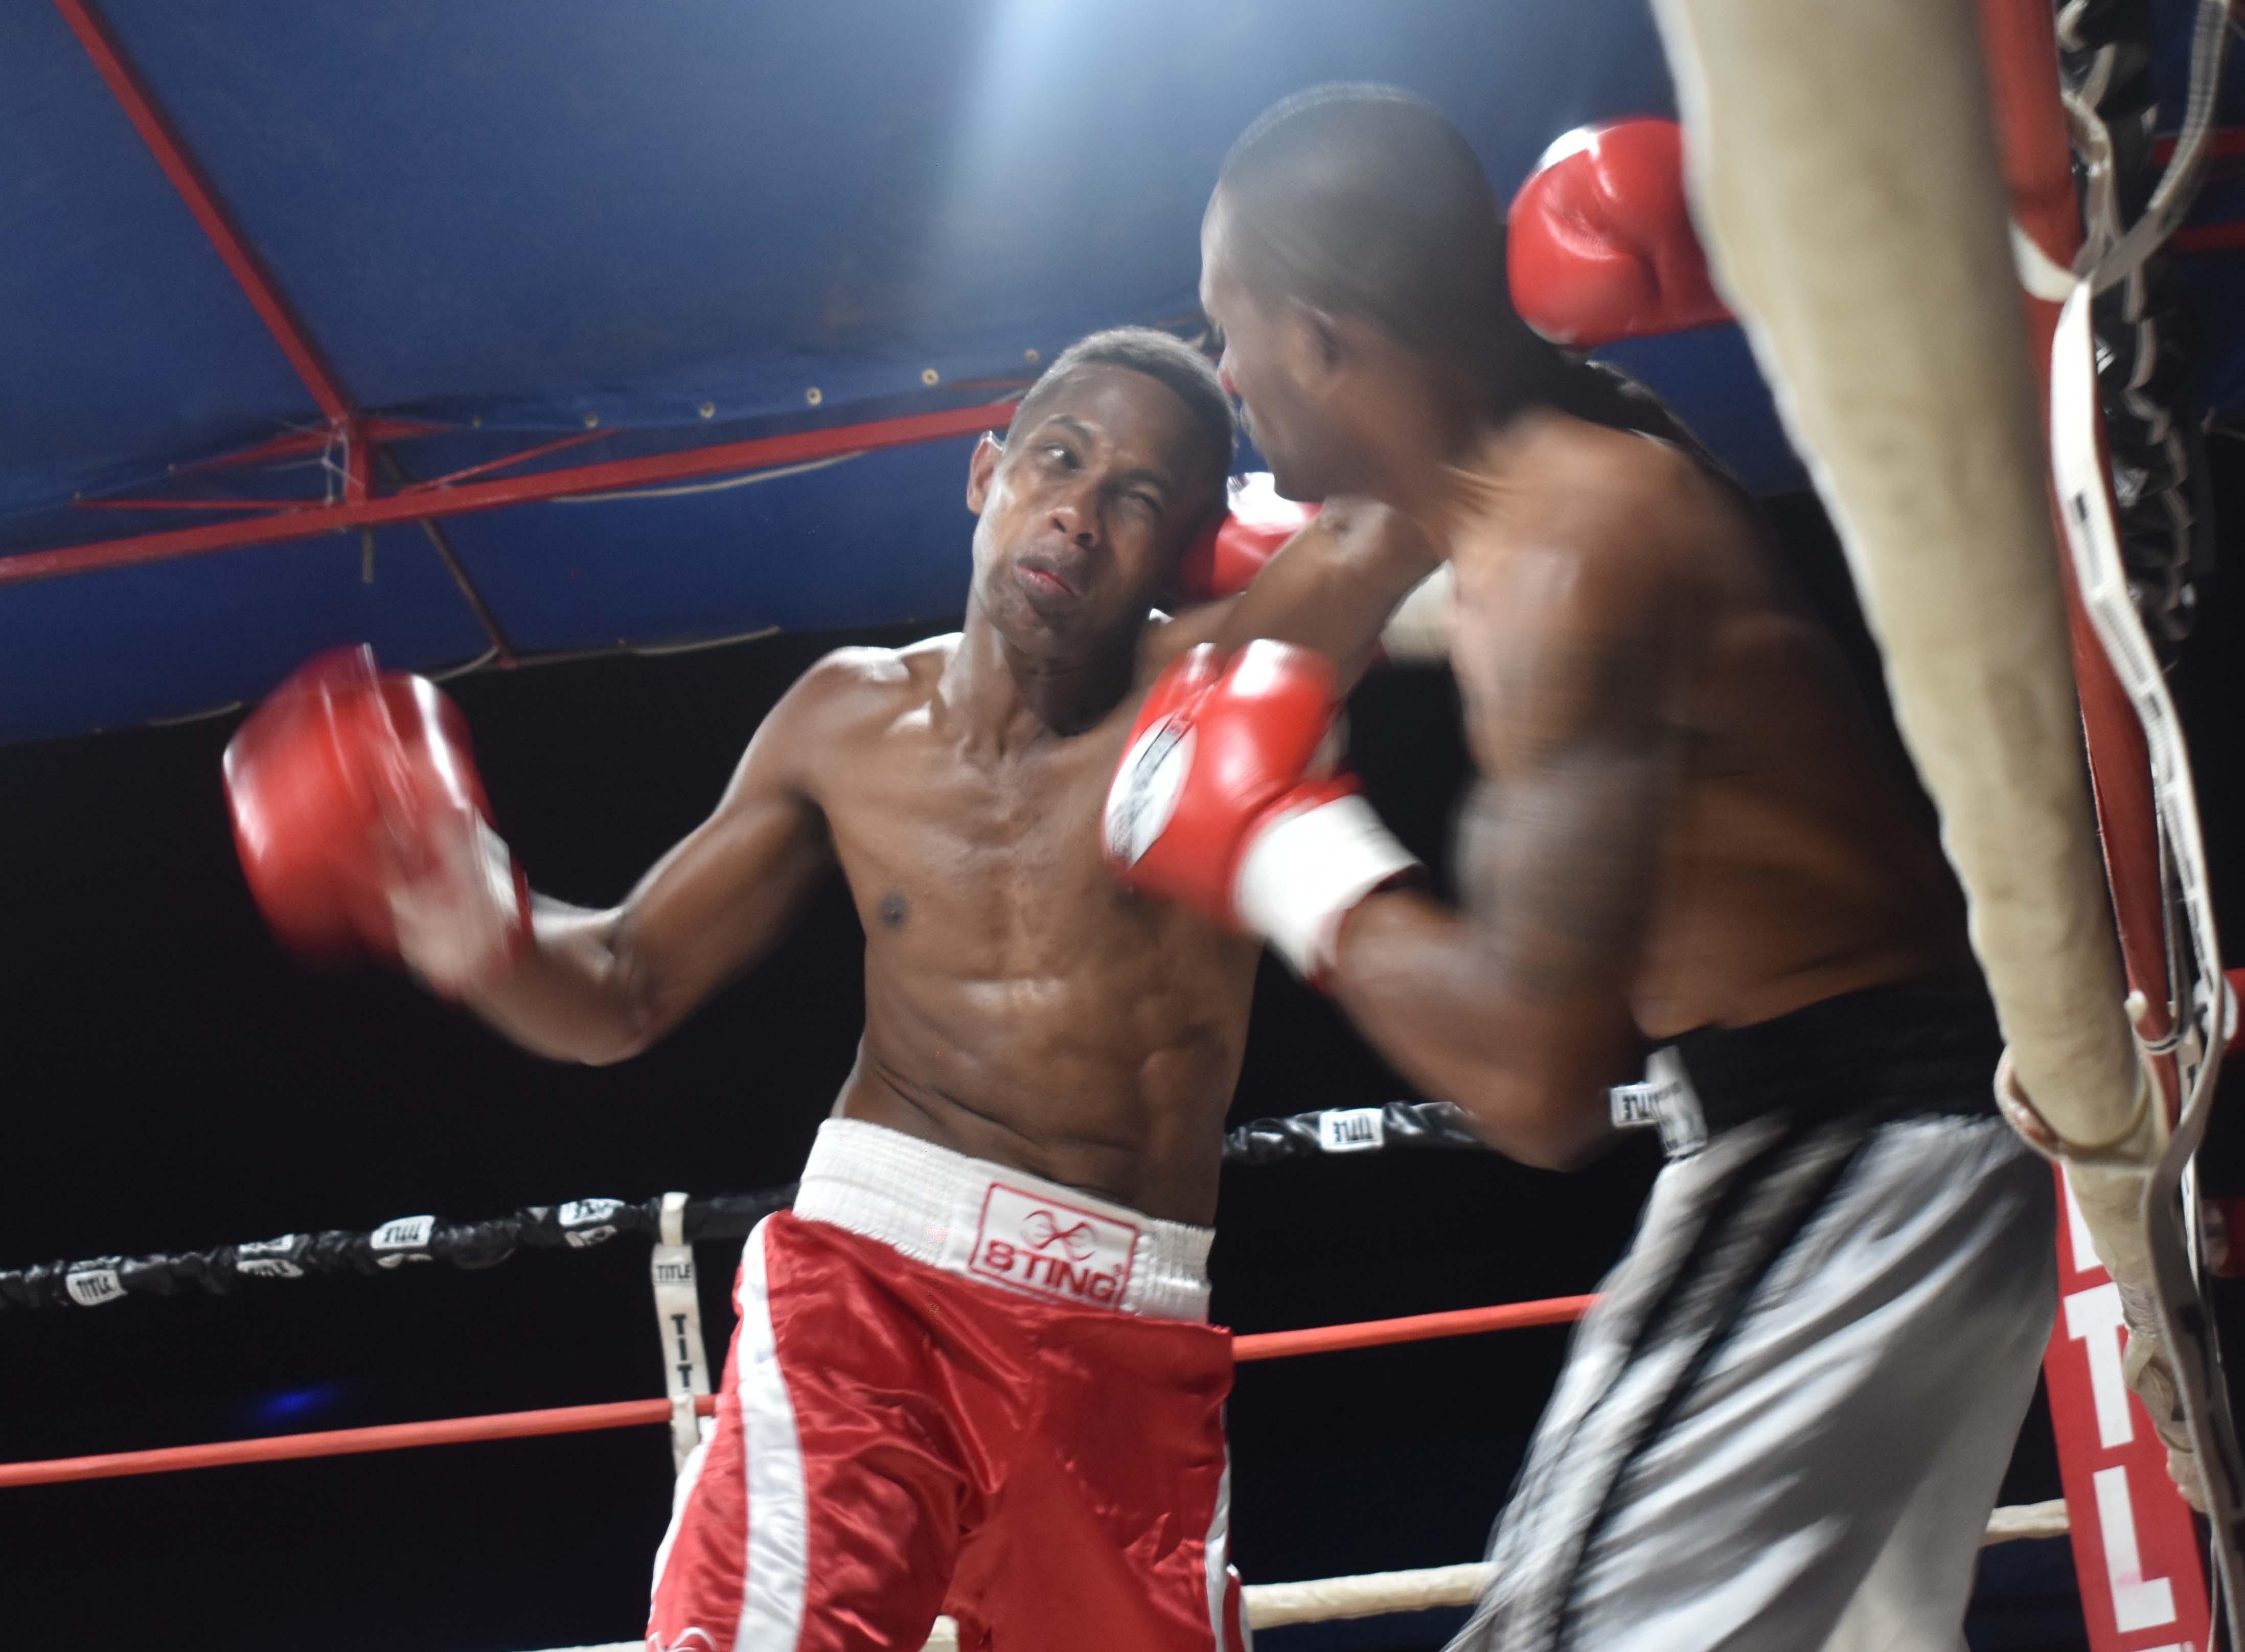 Iosefo Cakaunivalu - Tevita Seta in the boxing programe at the Prince Charles Park in Nadi last night. Photo: WAISEA NASOKIAi